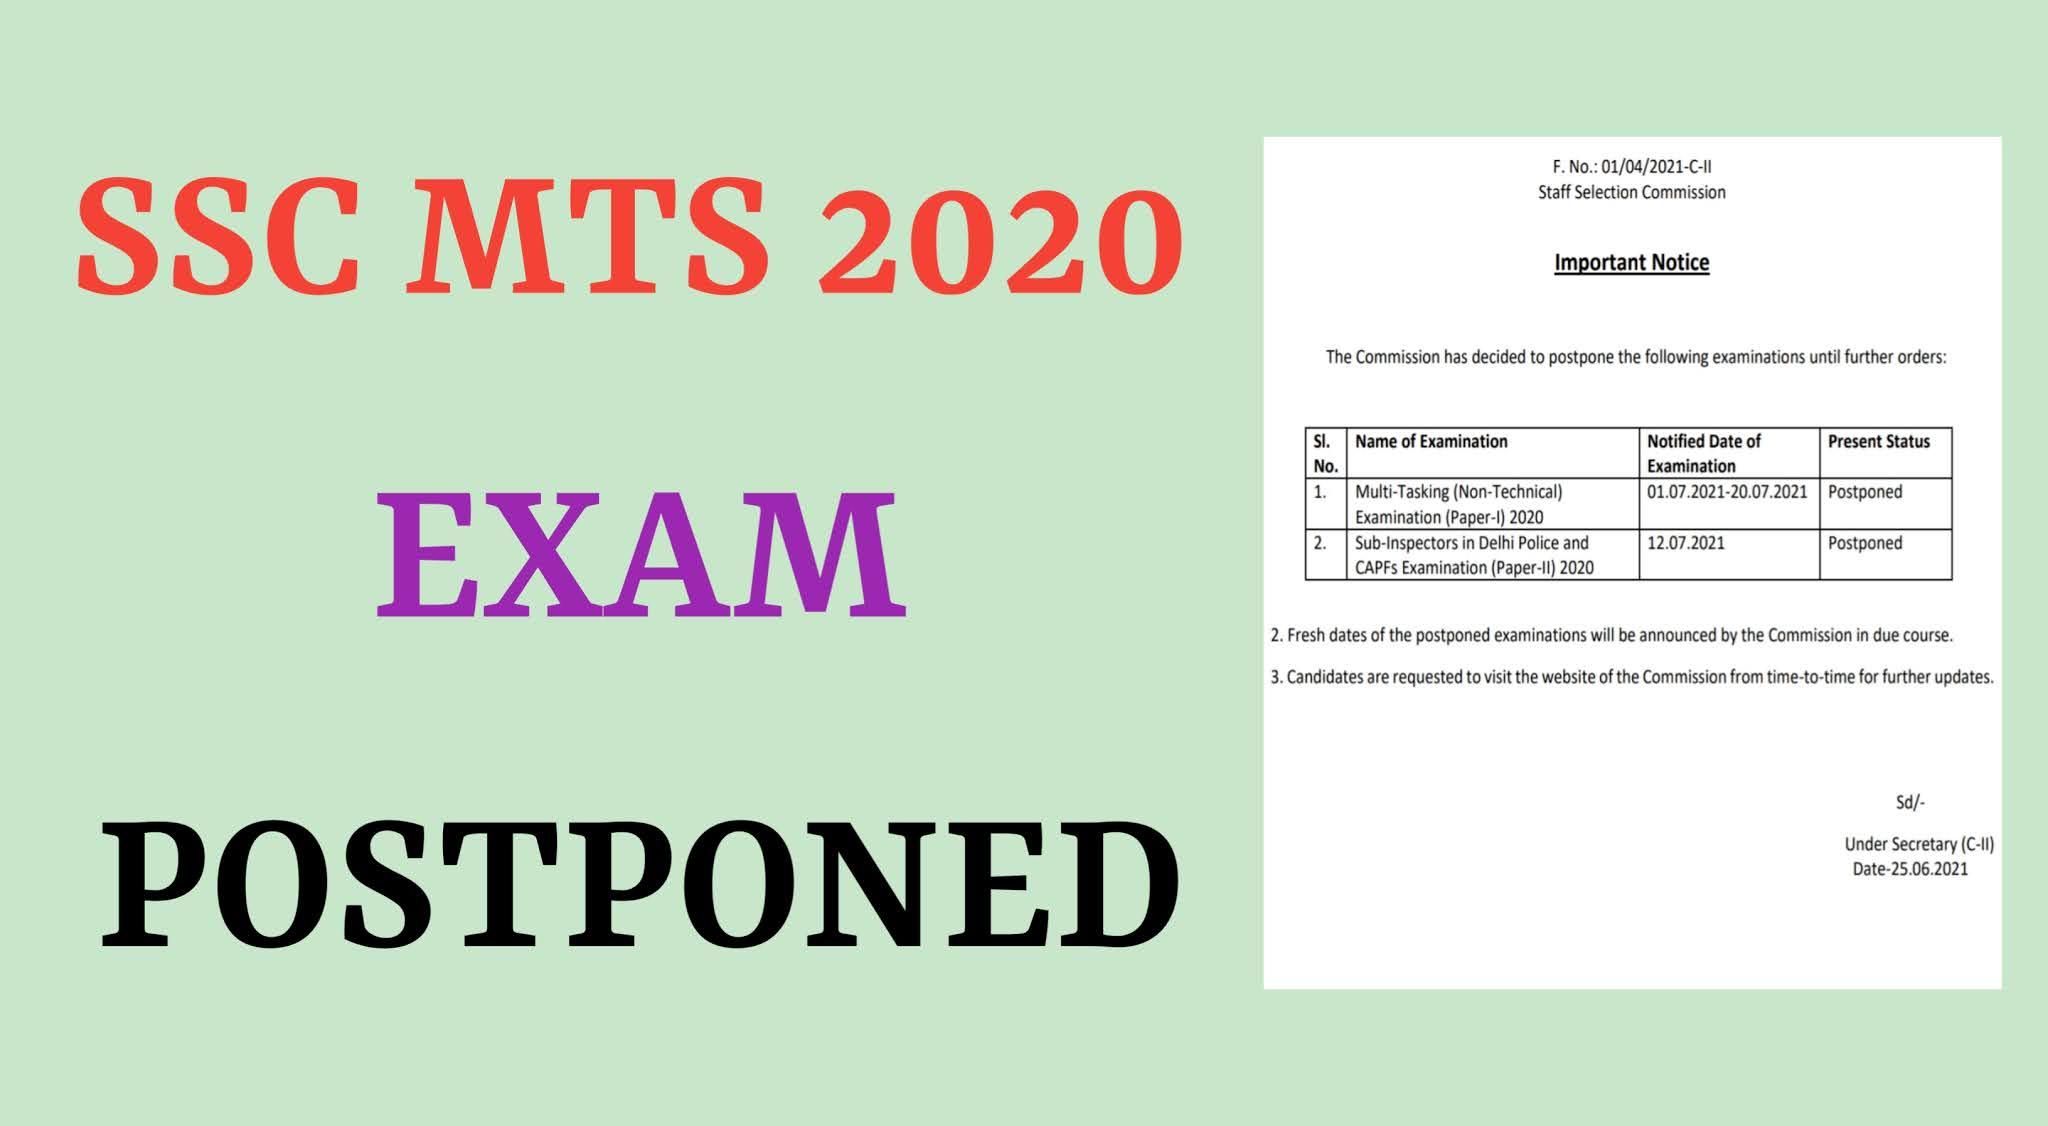 SSC MTS EXAM POSTPONED 2021 | SSC MTS EXAM POSTPONED 2020-21 | SSC MTS (Tier-1) EXAM POSTPONED 2021 | SSC MTS (Tier-1) EXAM 2021 POSTPONED | SSC MTS (Tier-1) EXAM POSTPONED 2022 | SSC MTS (Tier-1) EXAM 2020 POSTPONED | SSC MTS EXAM POSTPONED 2020